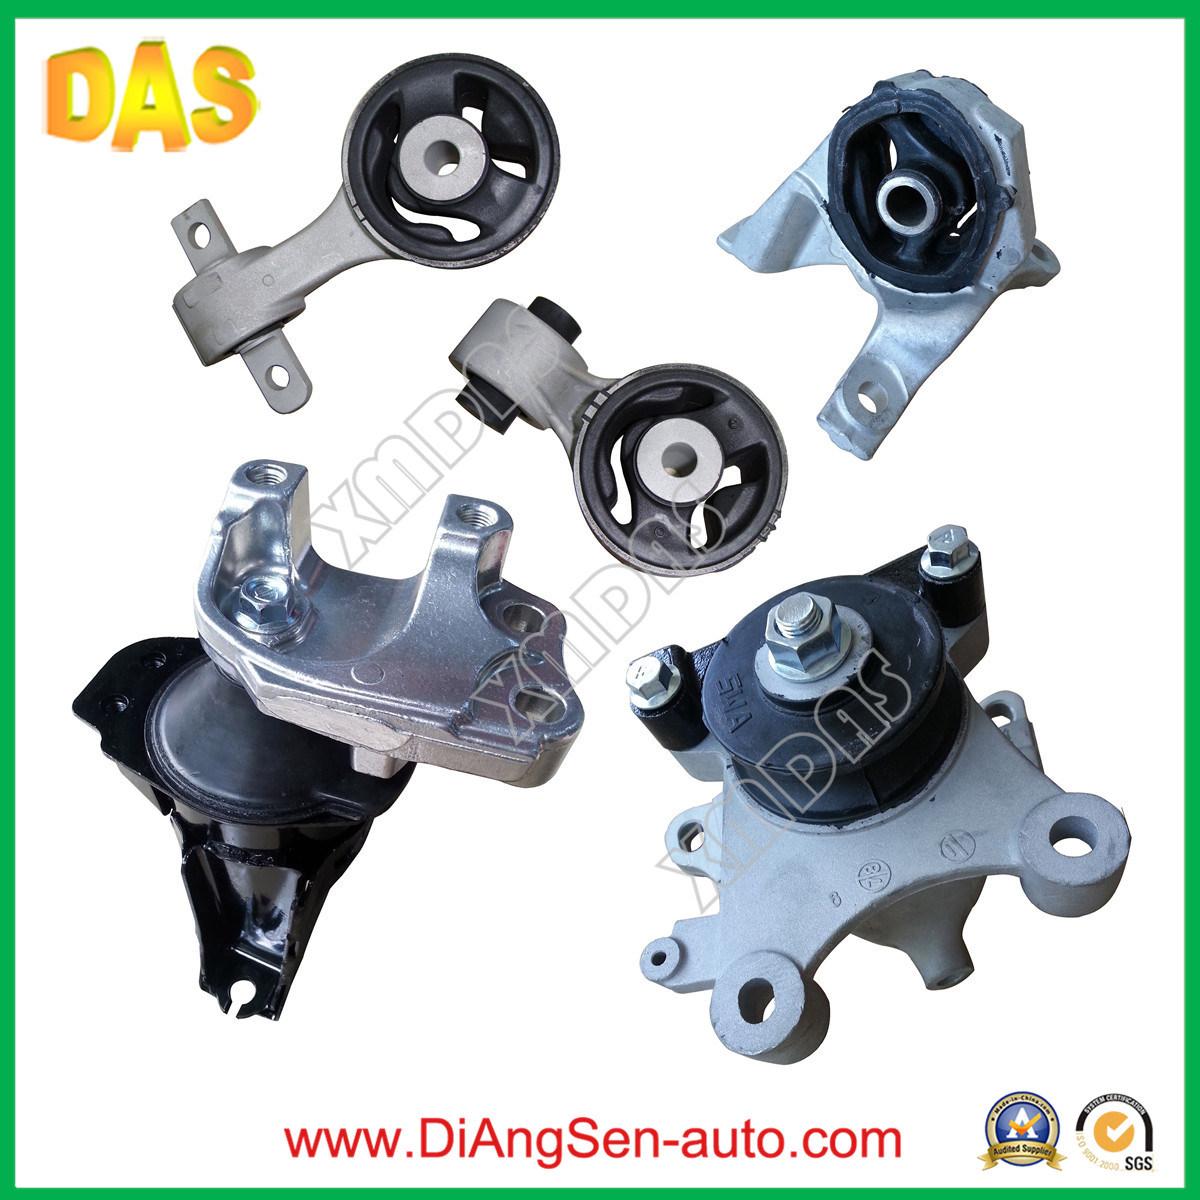 Auto/Car Parts--Engine Rubber Motor Mounting for Honda Acura (50820-SNB-J01, 50830-SVB-A01, 50850-SWA-A02, 50880-SVB-A02, 50890-SVB-A02)